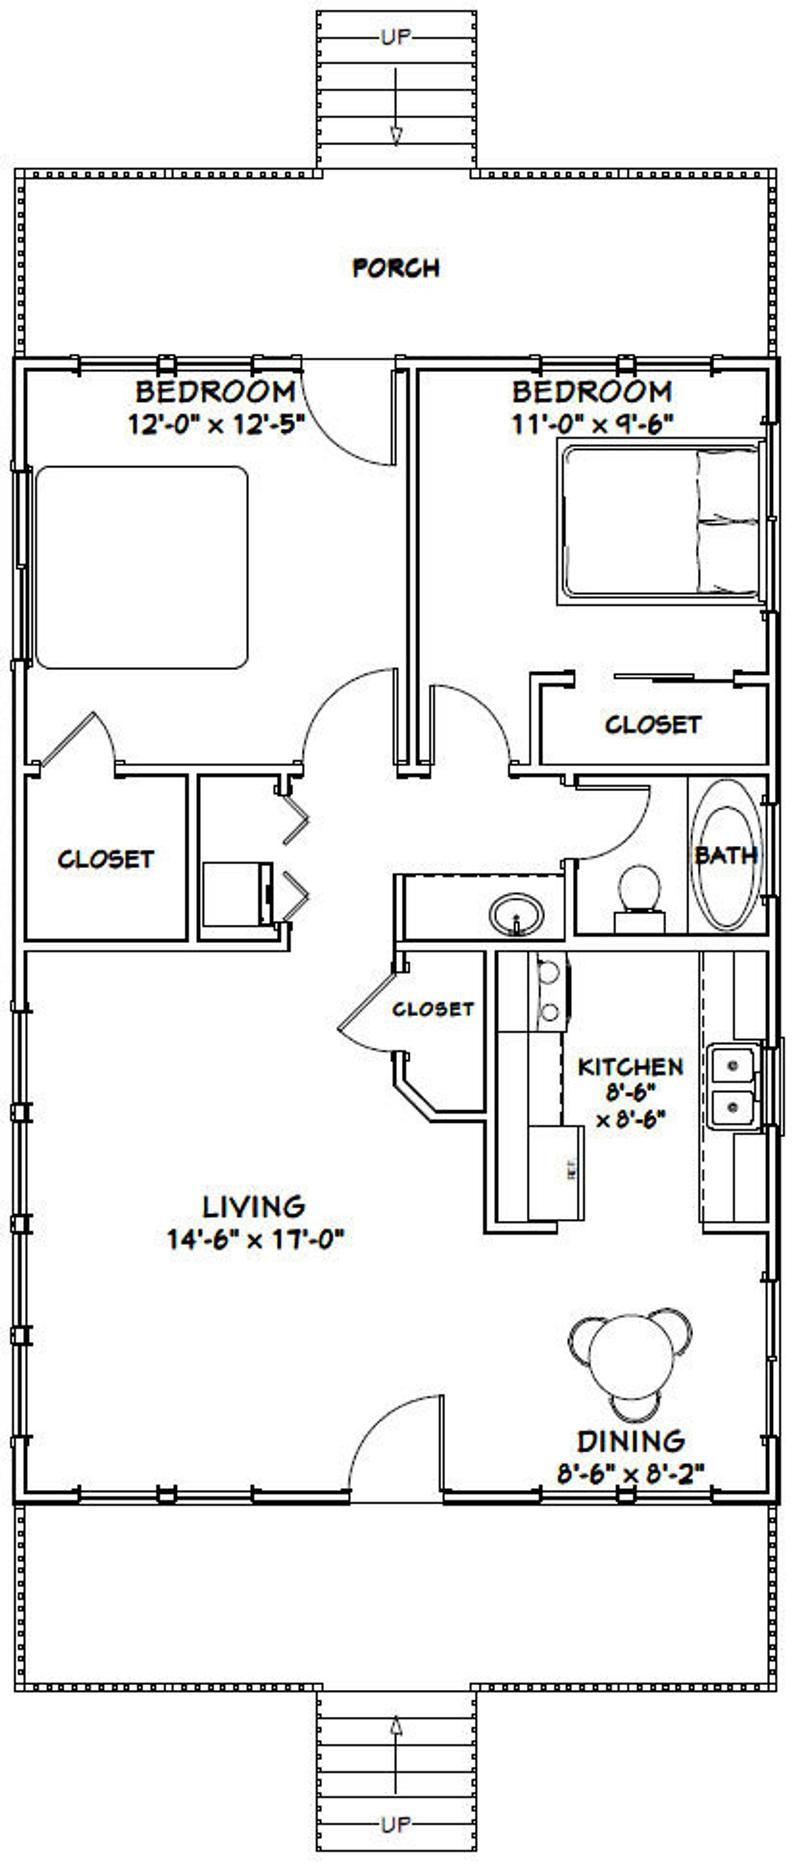 24x36 House 2 Bedroom 1 Bath 864 Sq Ft Pdf Floor Plan Etsy In 2021 Bedroom House Plans Cabin Floor Plans Small House Plans